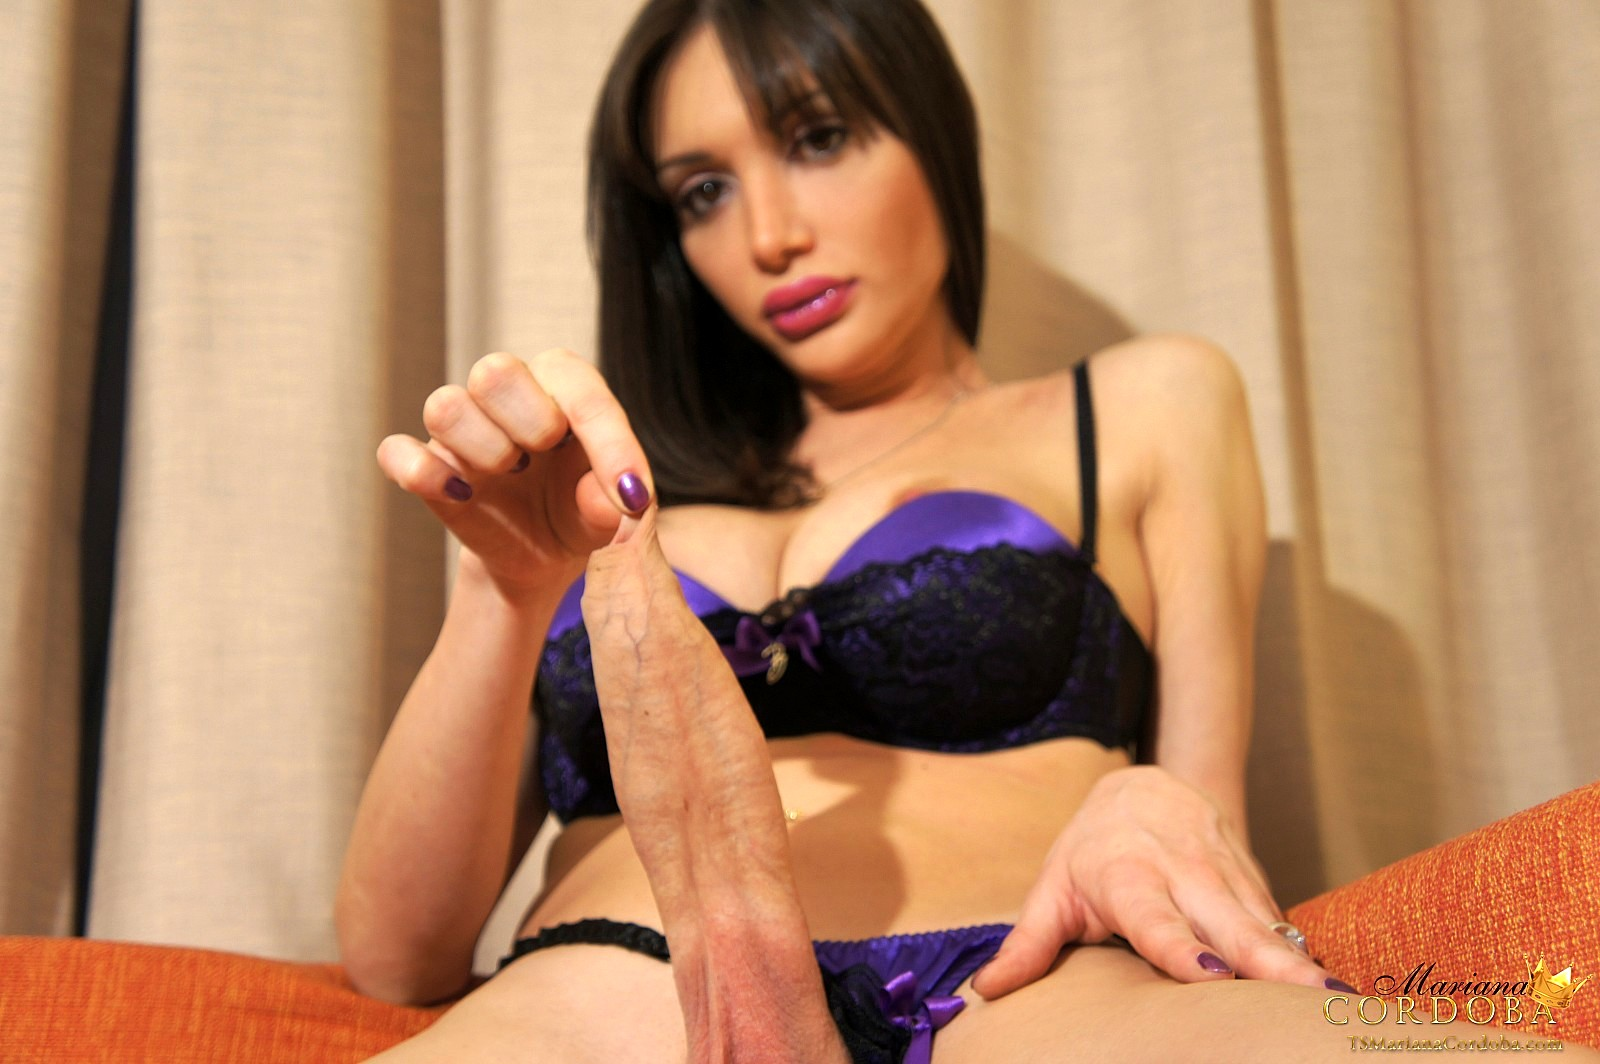 Mariana In Purple Stroking Her Monster Penis